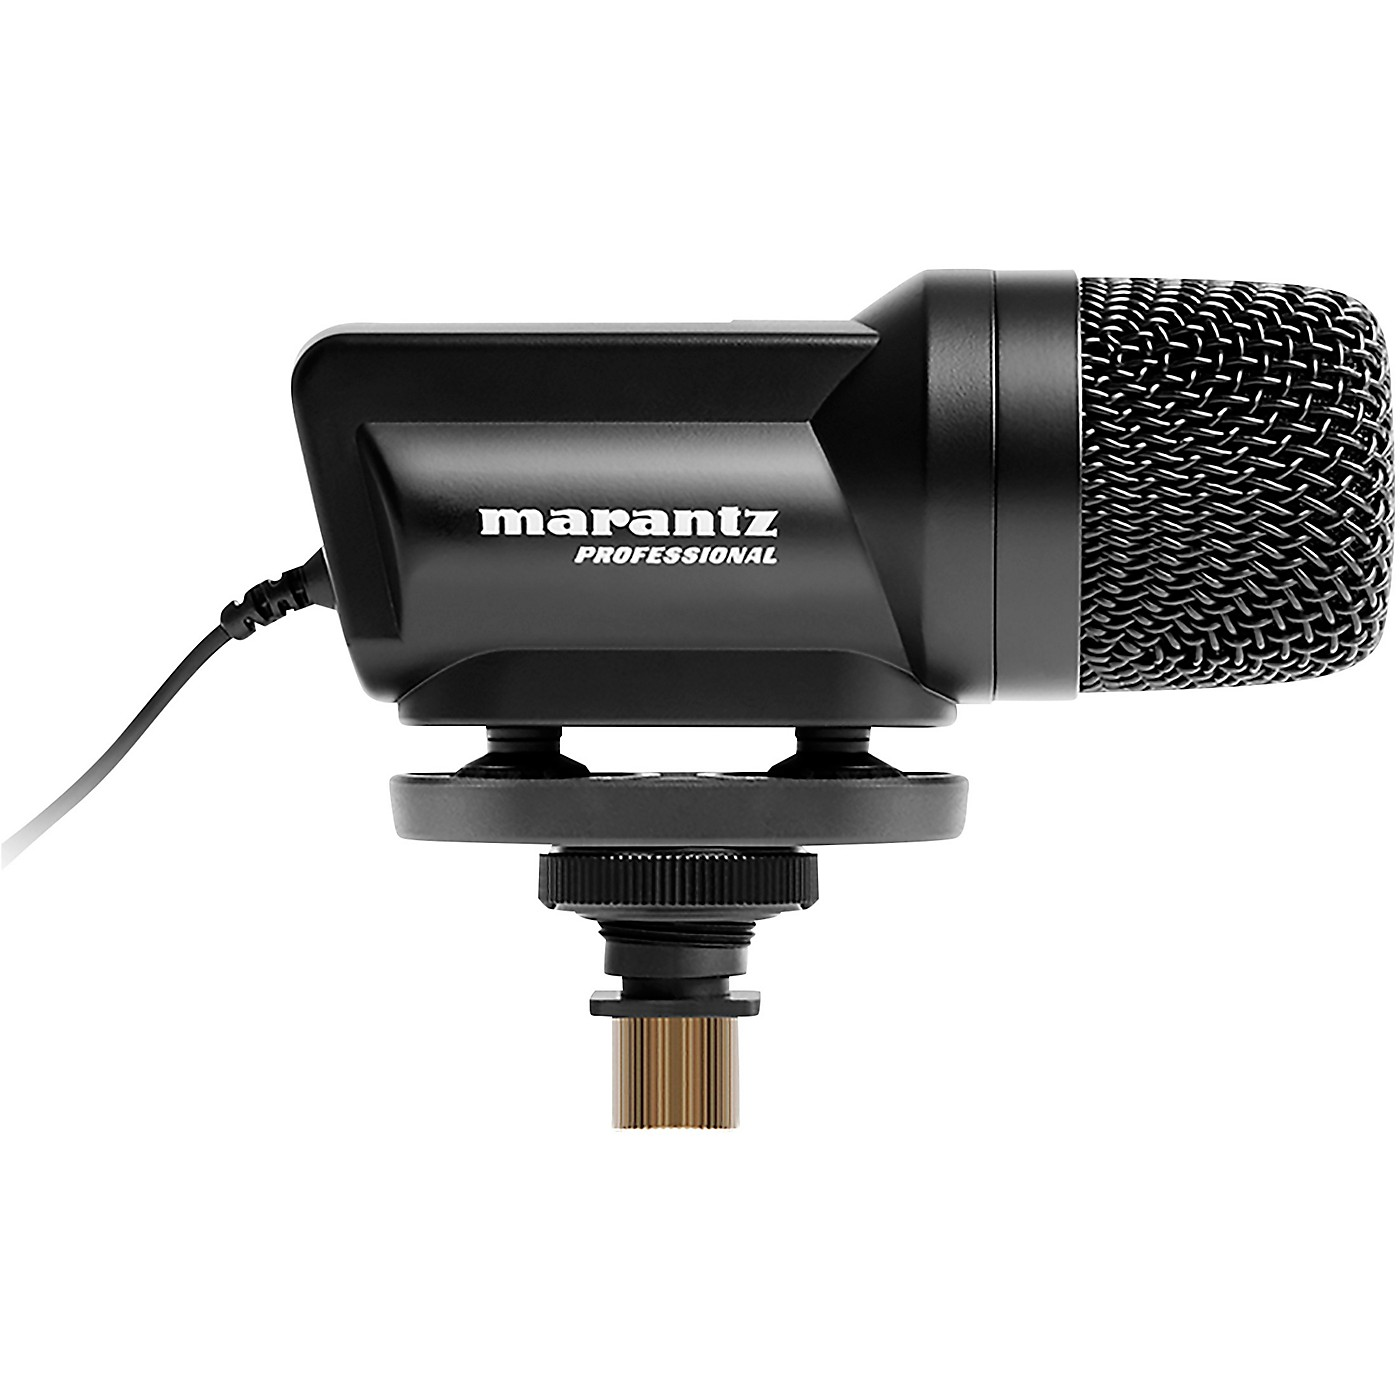 Marantz Professional Audio Scope SB-C2, X/Y Stereo condenser microphone for DSLR cameras thumbnail